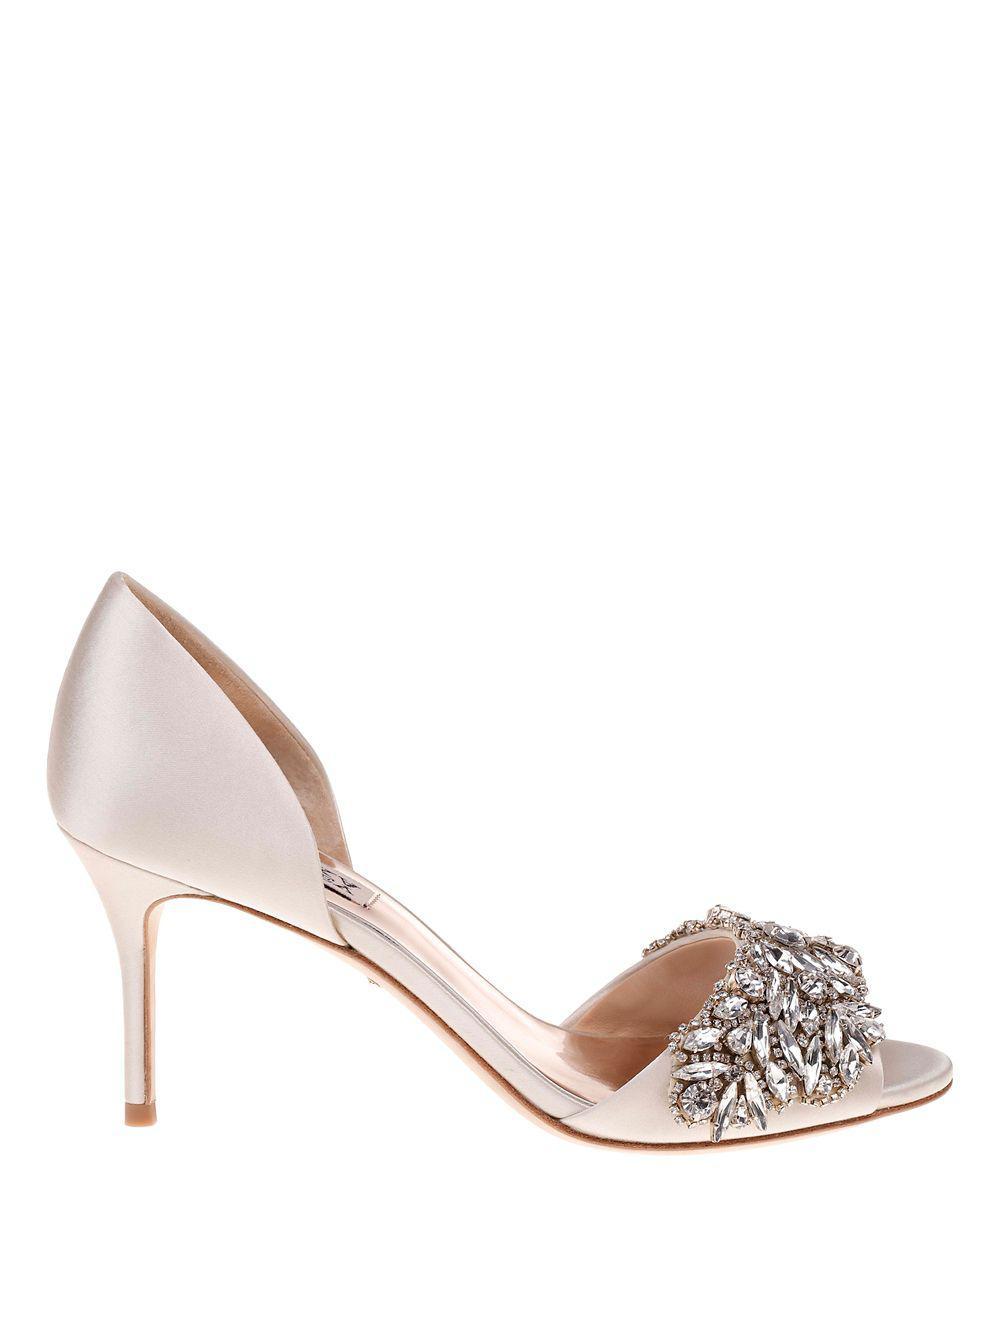 Badgley Mischka Women's Hansen Crystal Embellished Sandal mTWI5BSg